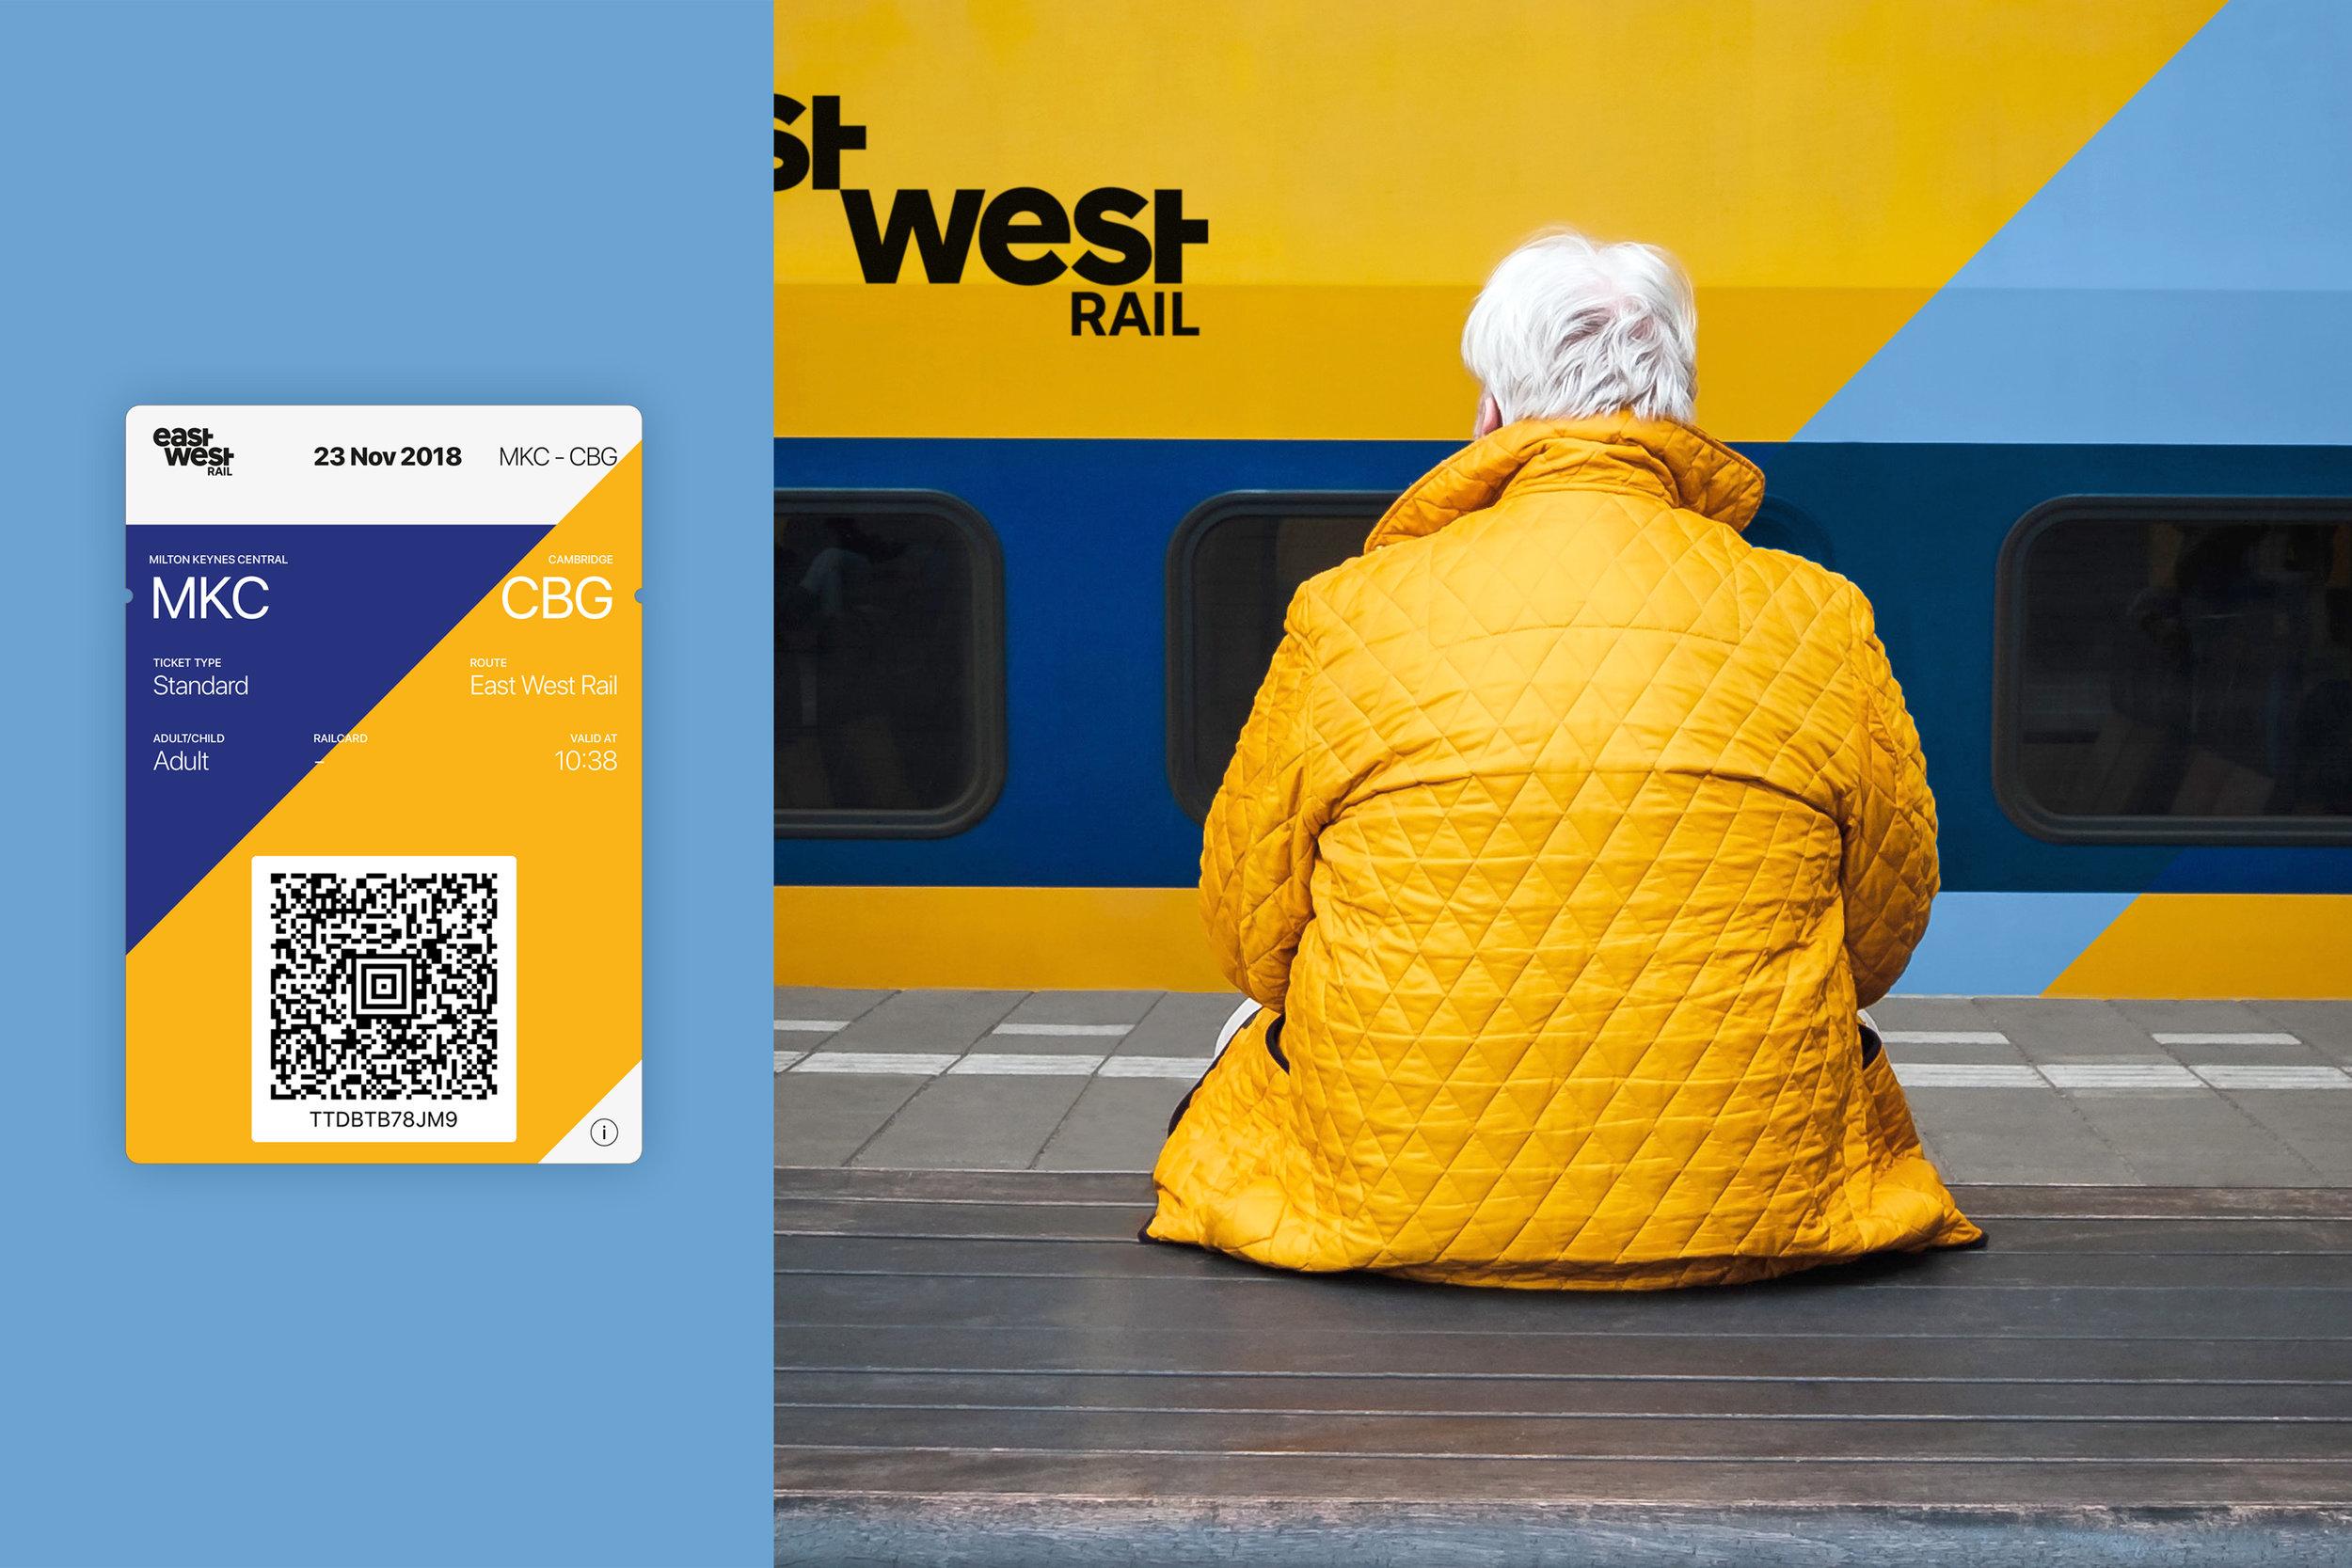 Re_EWR_Train.jpg